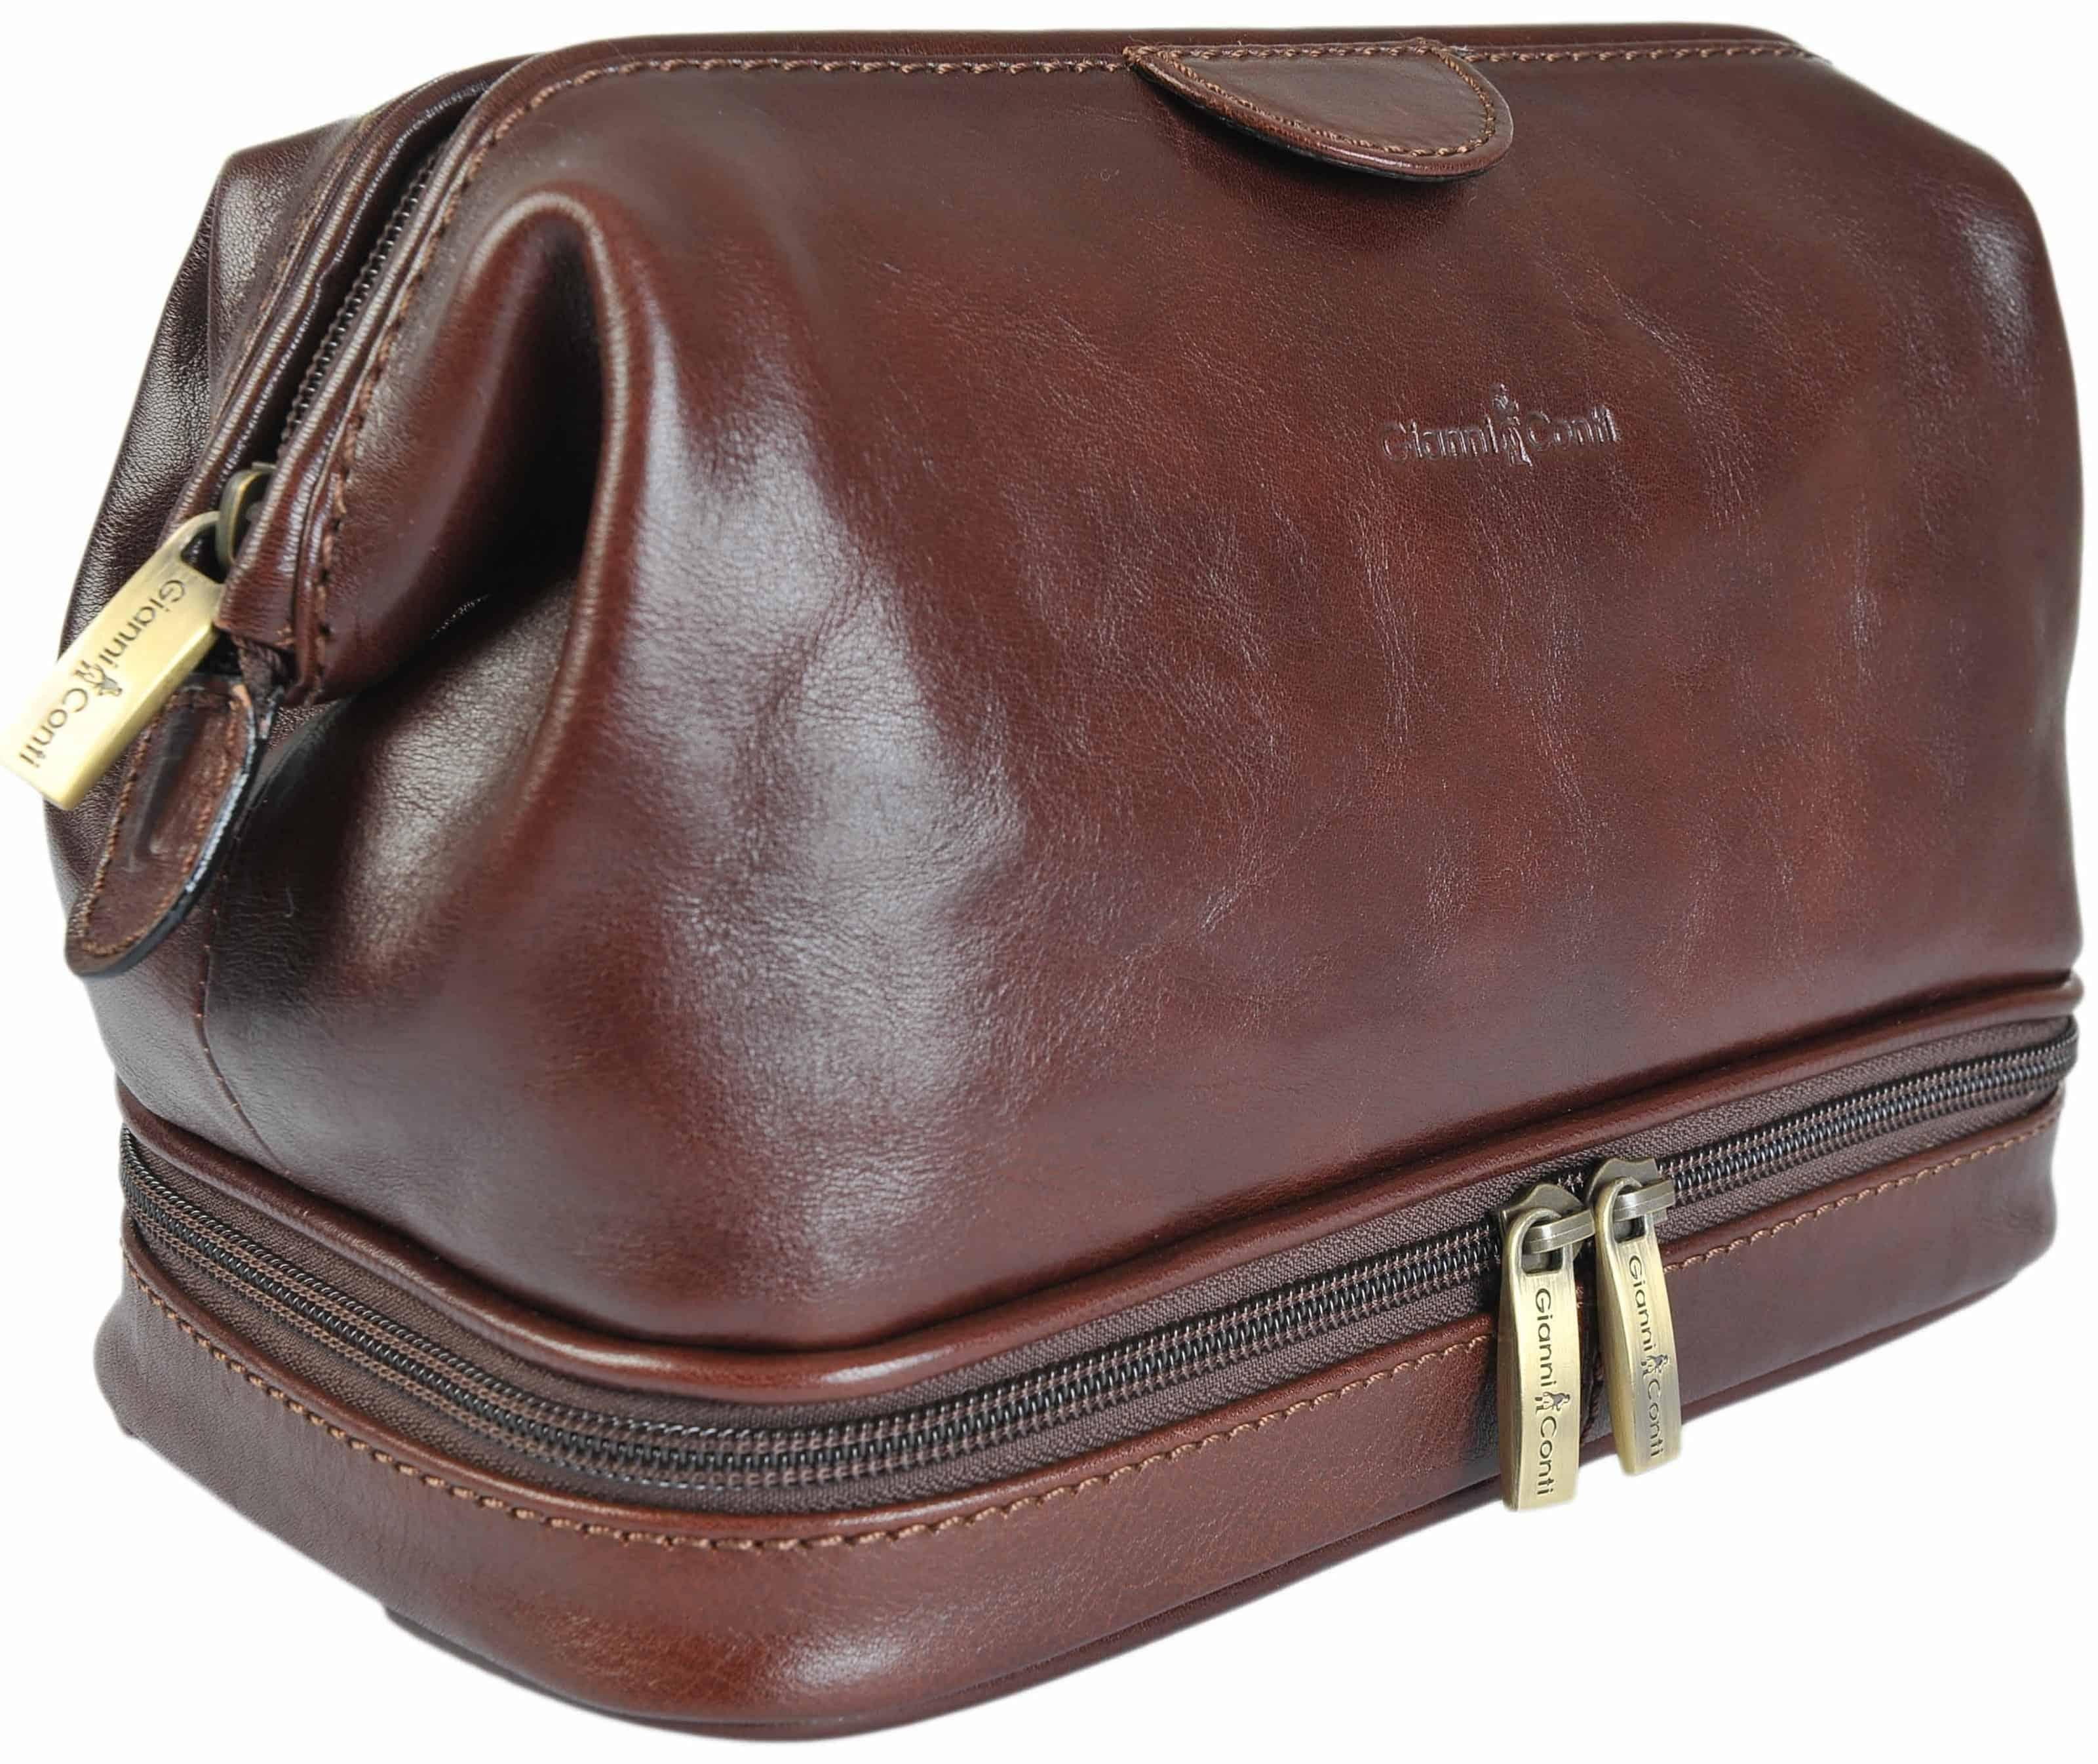 b47ba91fee Gianni Conti Fine Italian Leather Brown Frame Travel Wash Toiletry Bag  905011